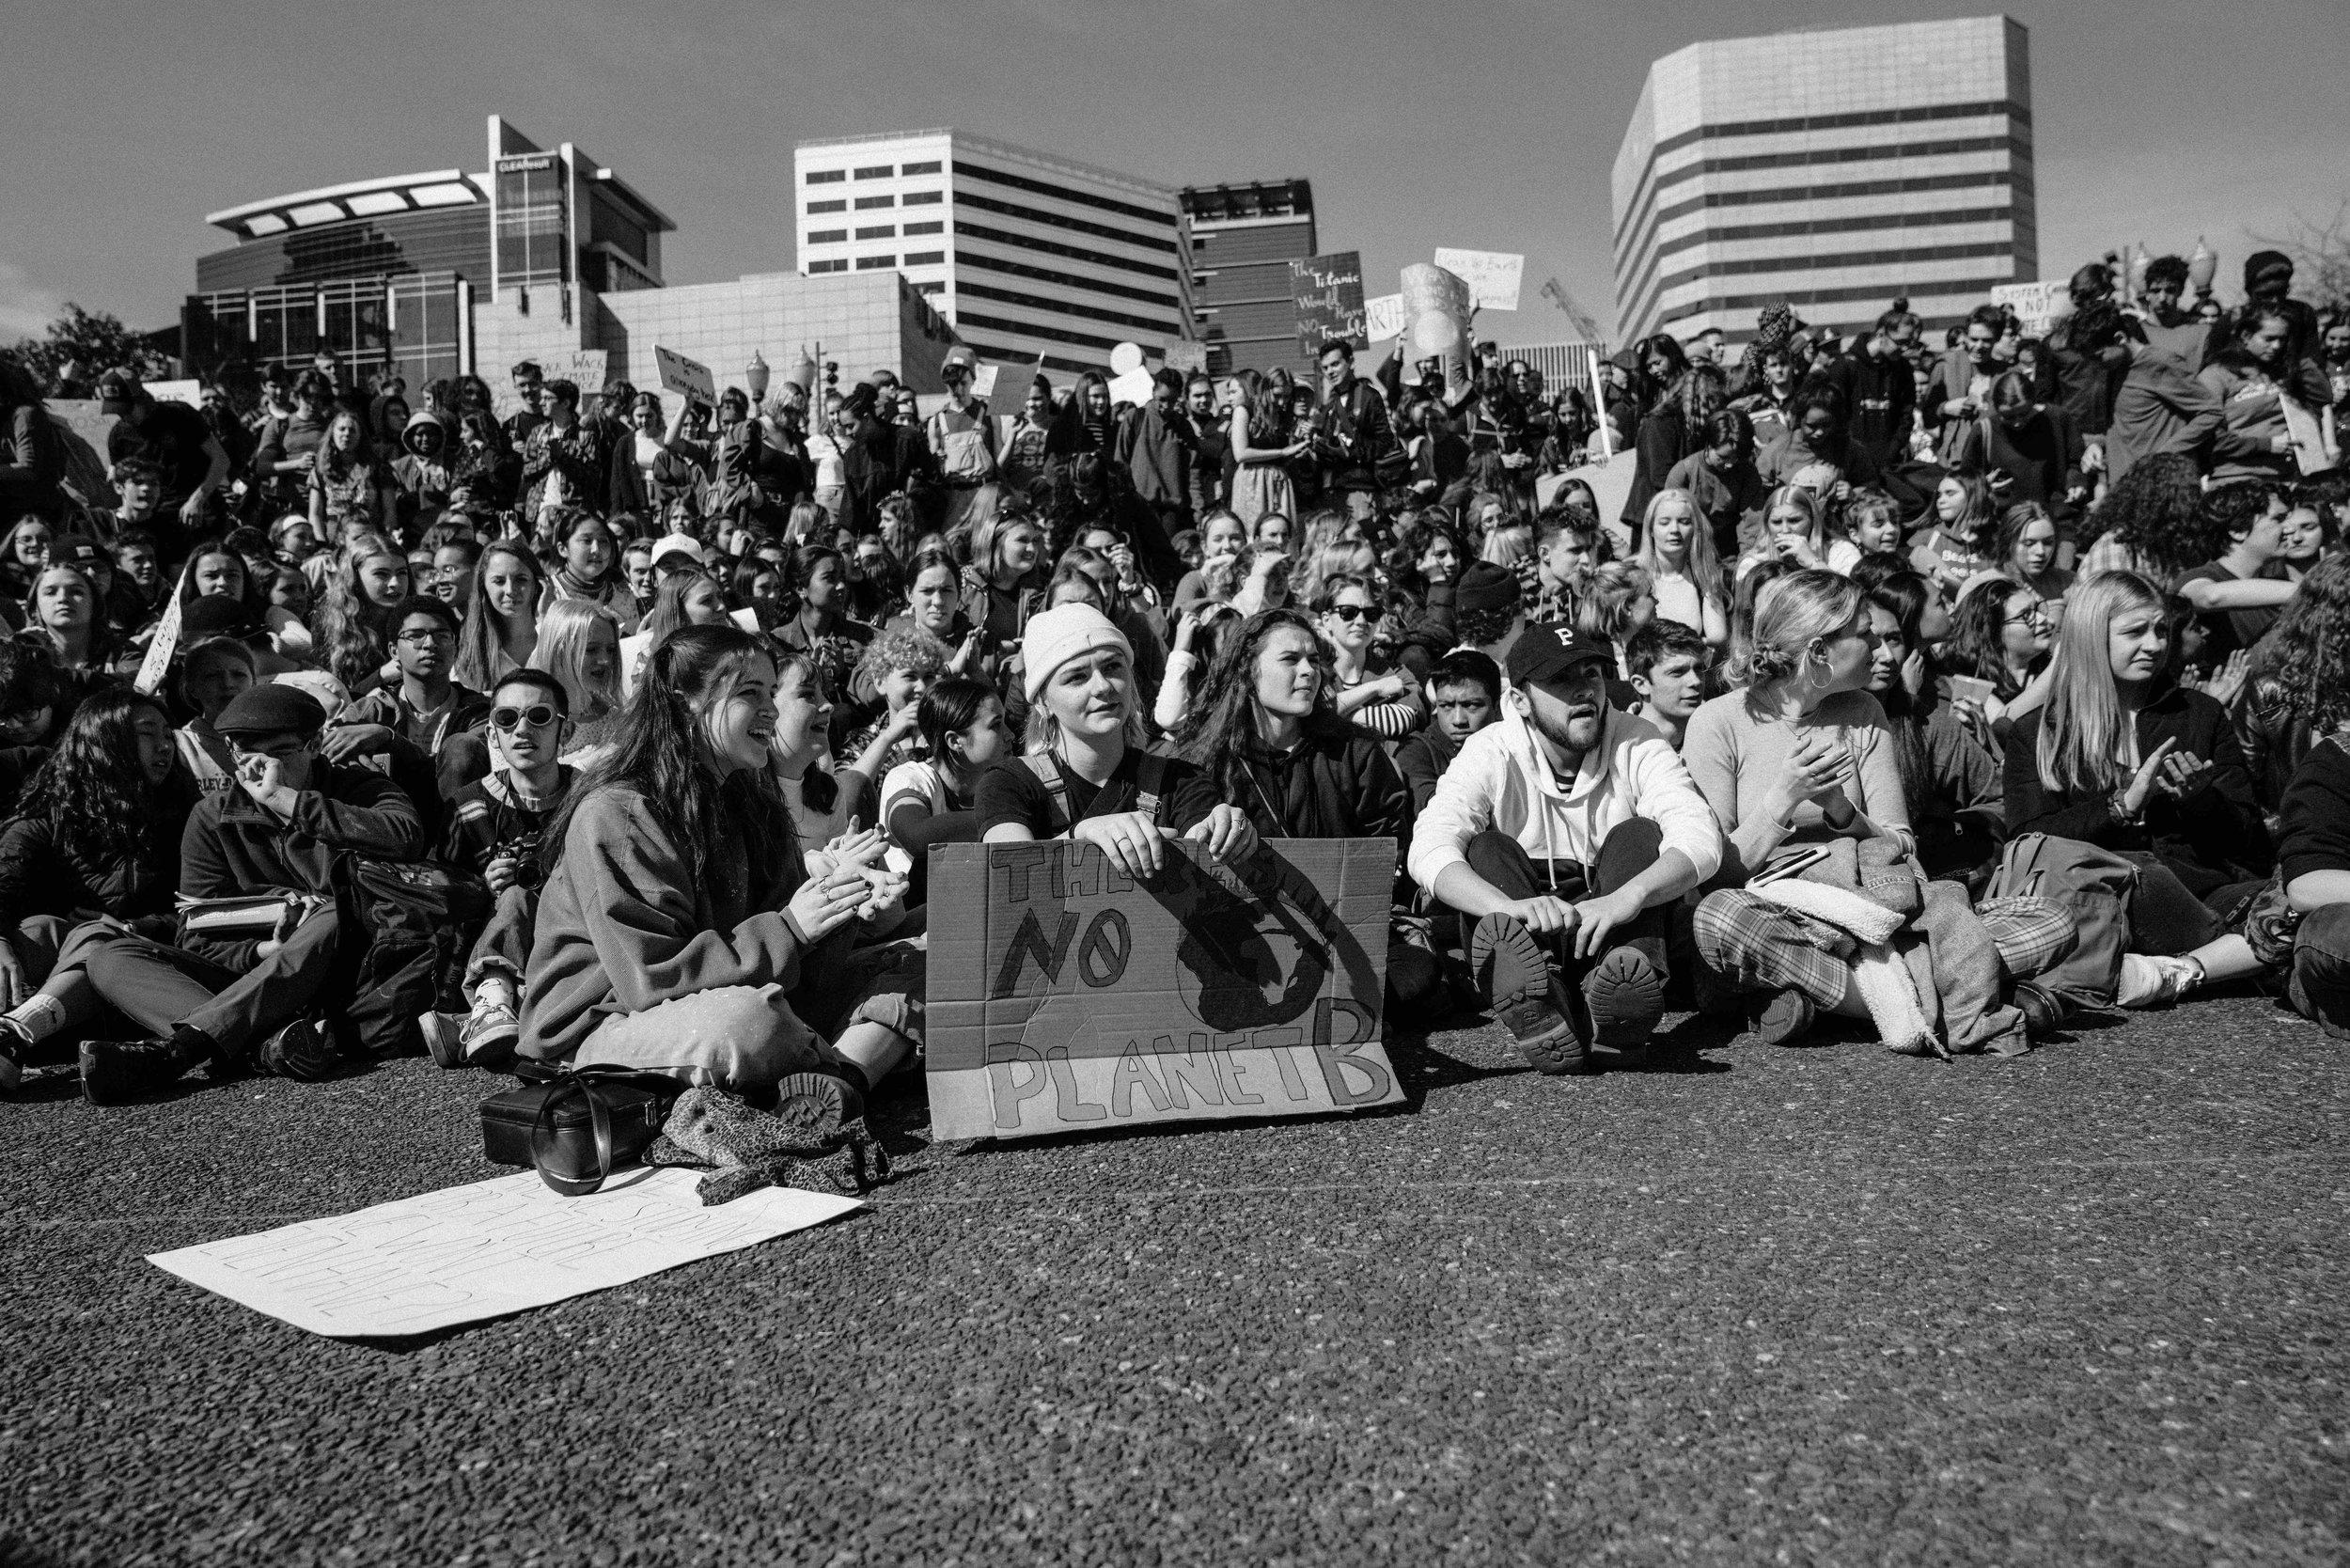 josue-rivas-student-strike-climate-change-portland.jpg